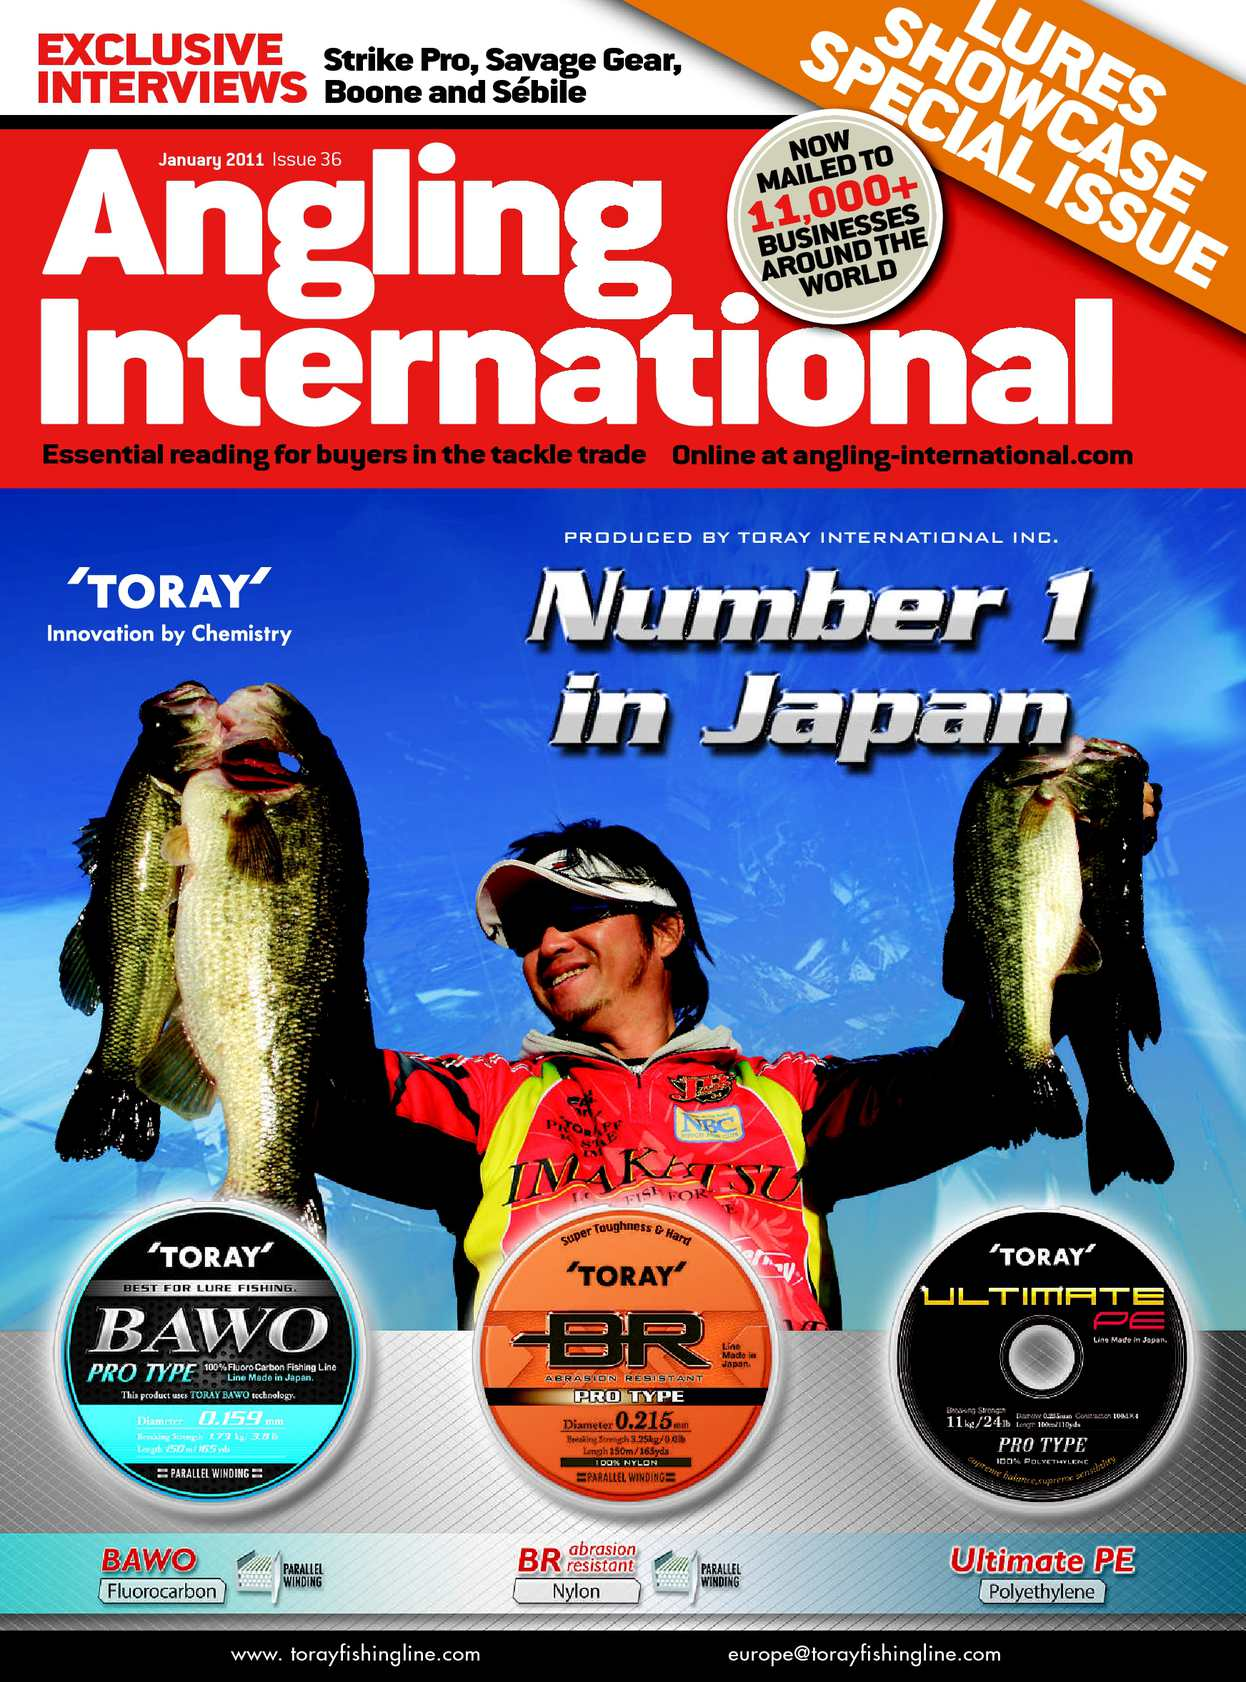 boat and all predator fishing Feeder Jig Fishing Mould 8-10-12-15-18g /_shore